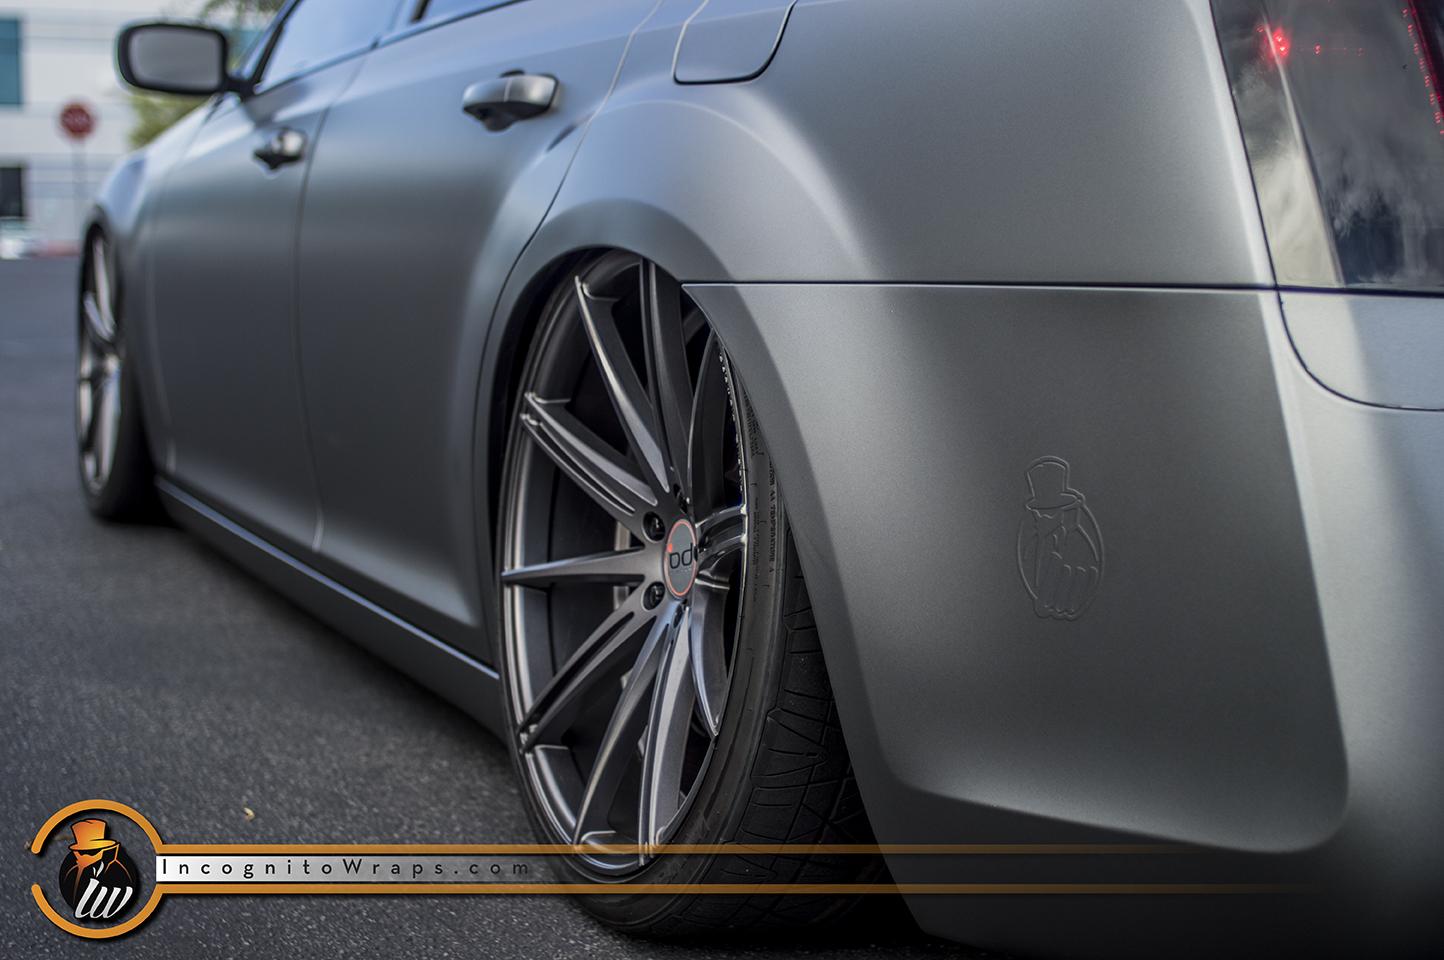 Chrysler 300 Matte Graphite Metallic Satin Wrap